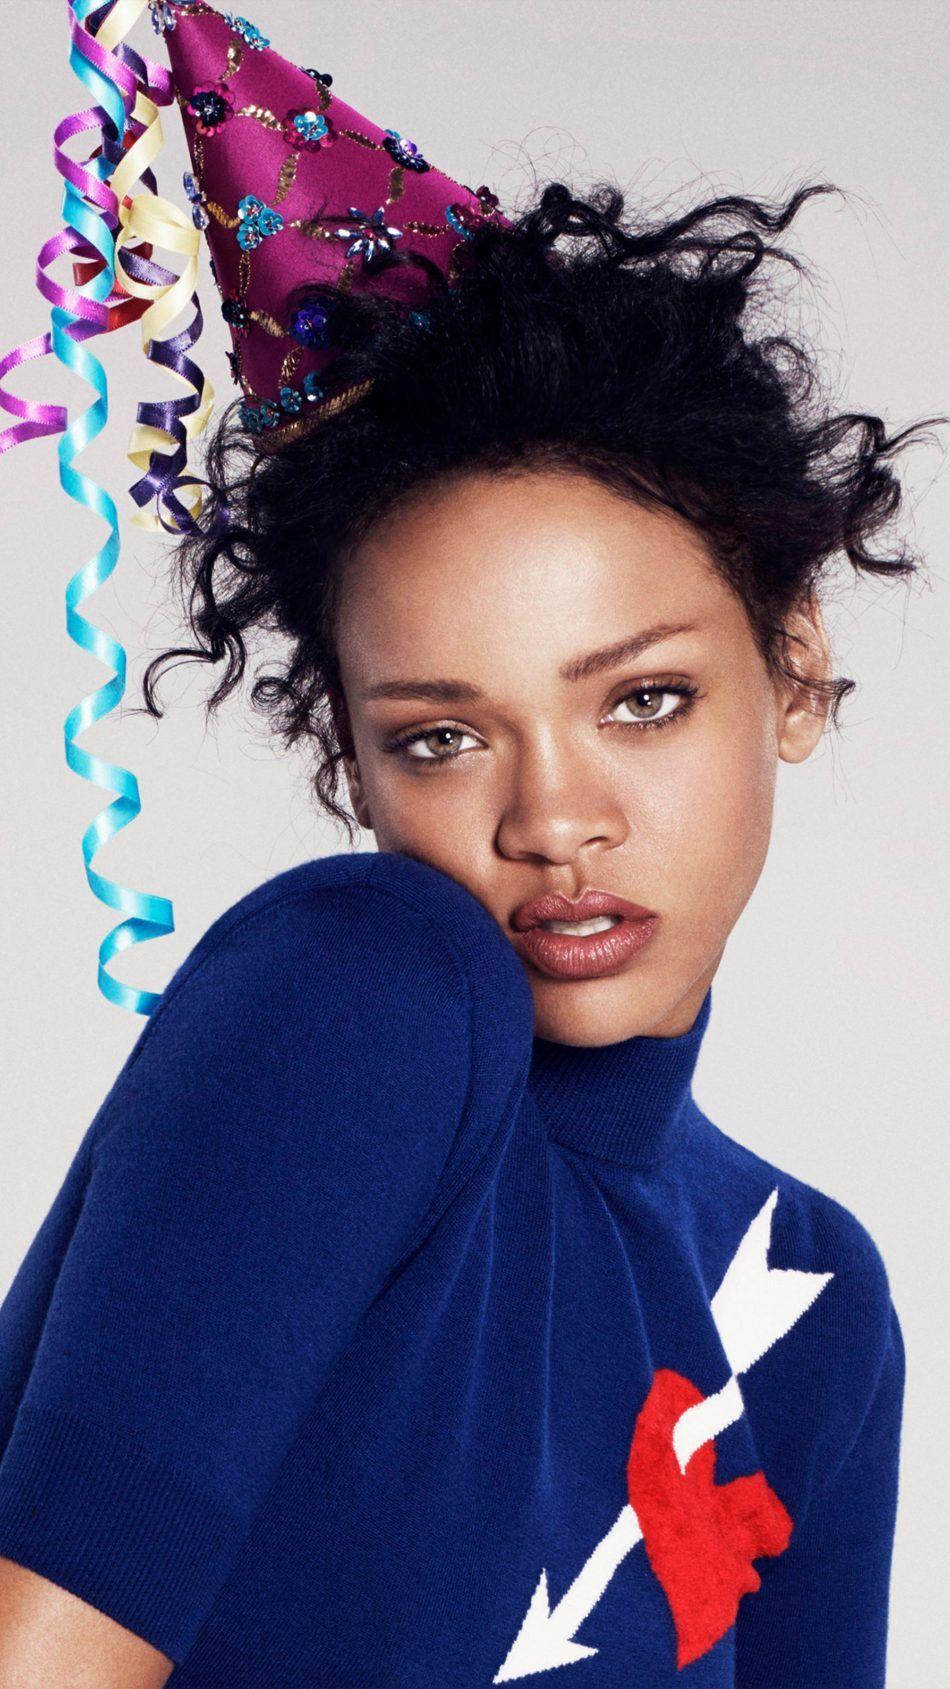 Rihanna Party Hat 4k Ultra Hd Mobile Wallpaper Rihanna Rihanna Photoshoot Rihanna Diamonds